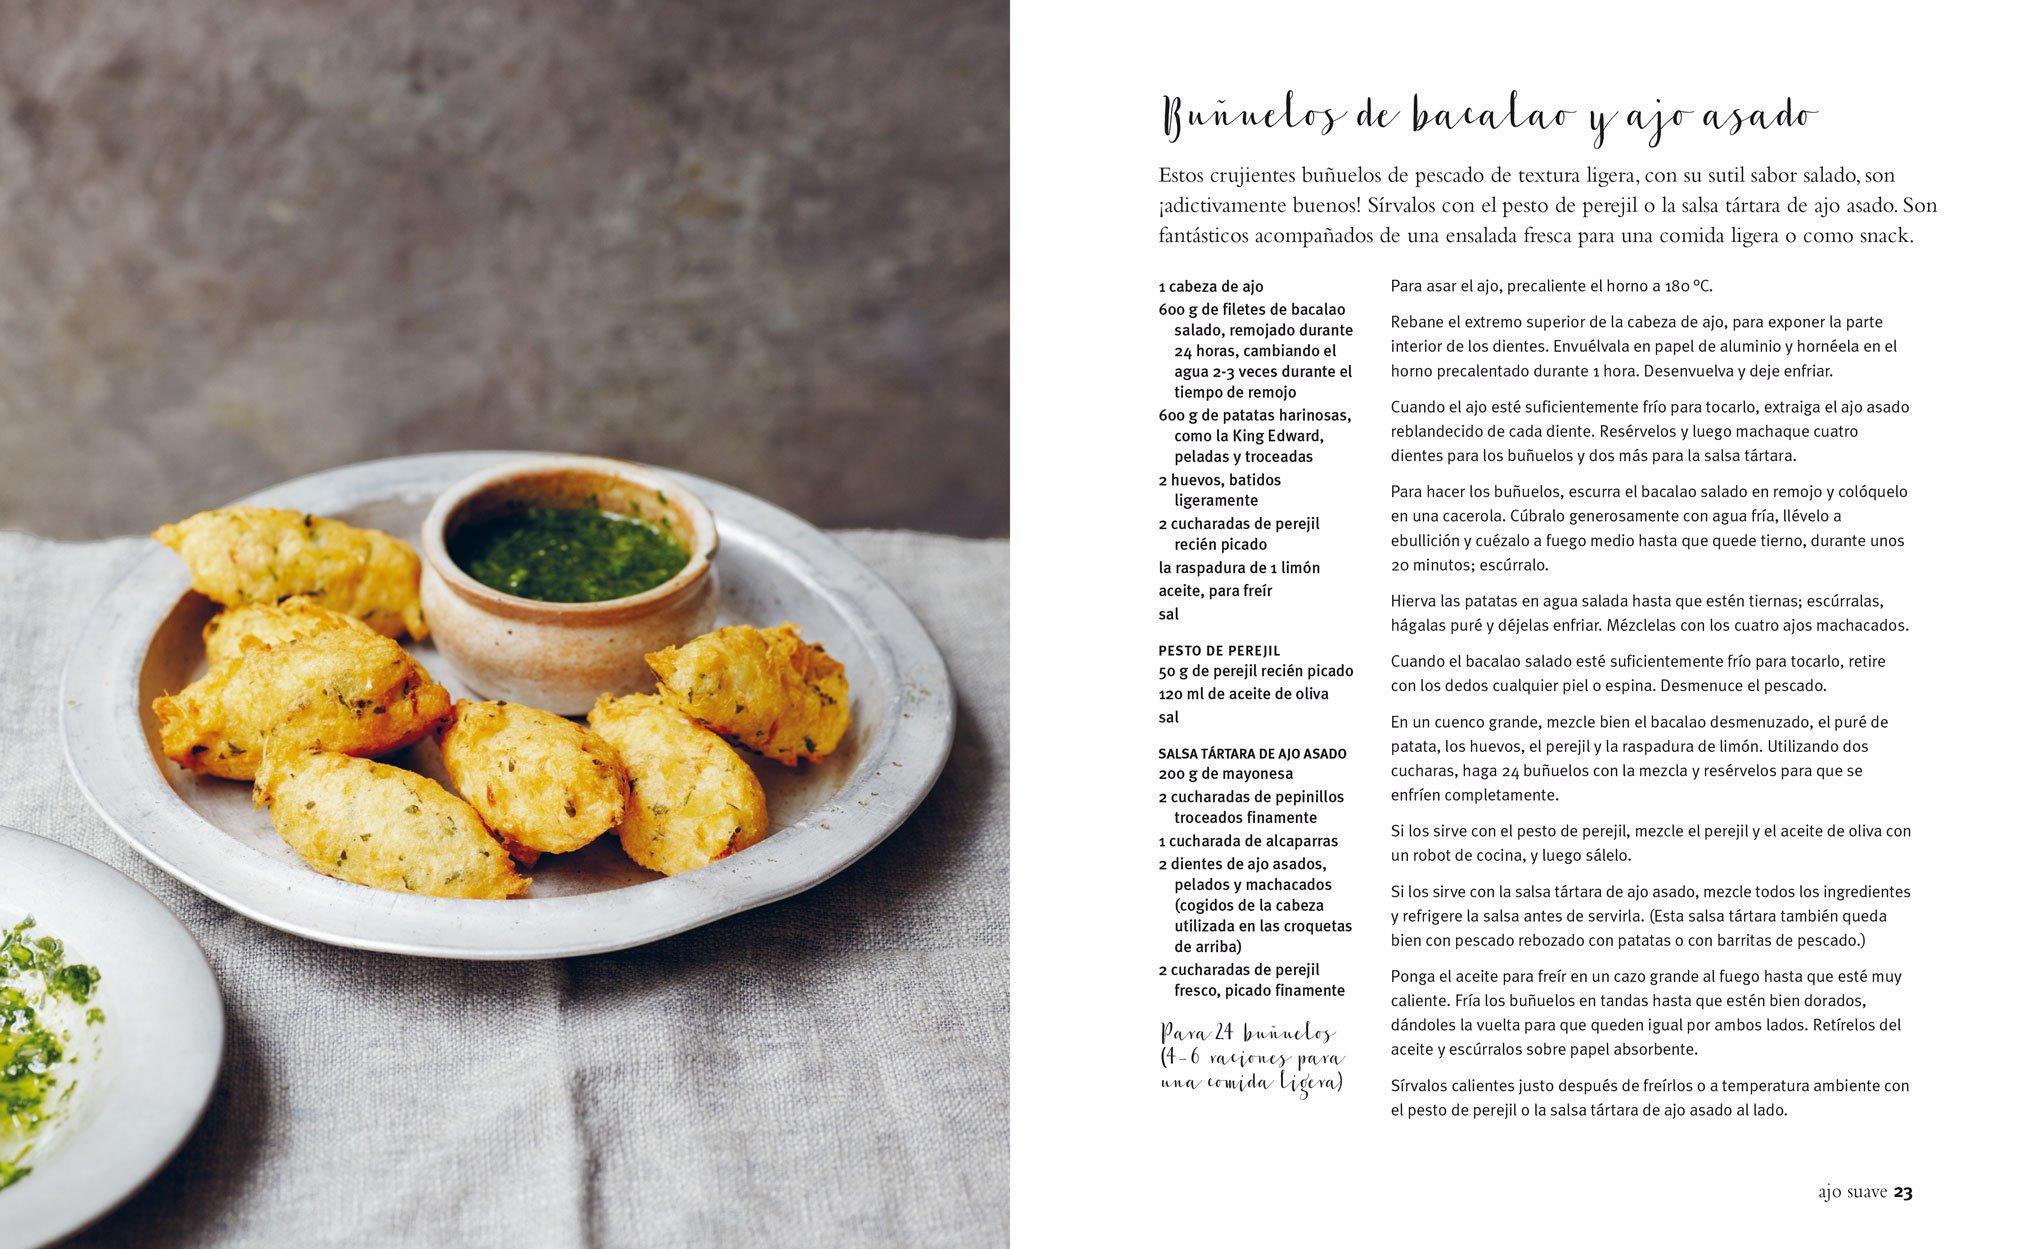 Cocina con ajo (Spanish Edition): Jenny Linford: 9788416407200 ...